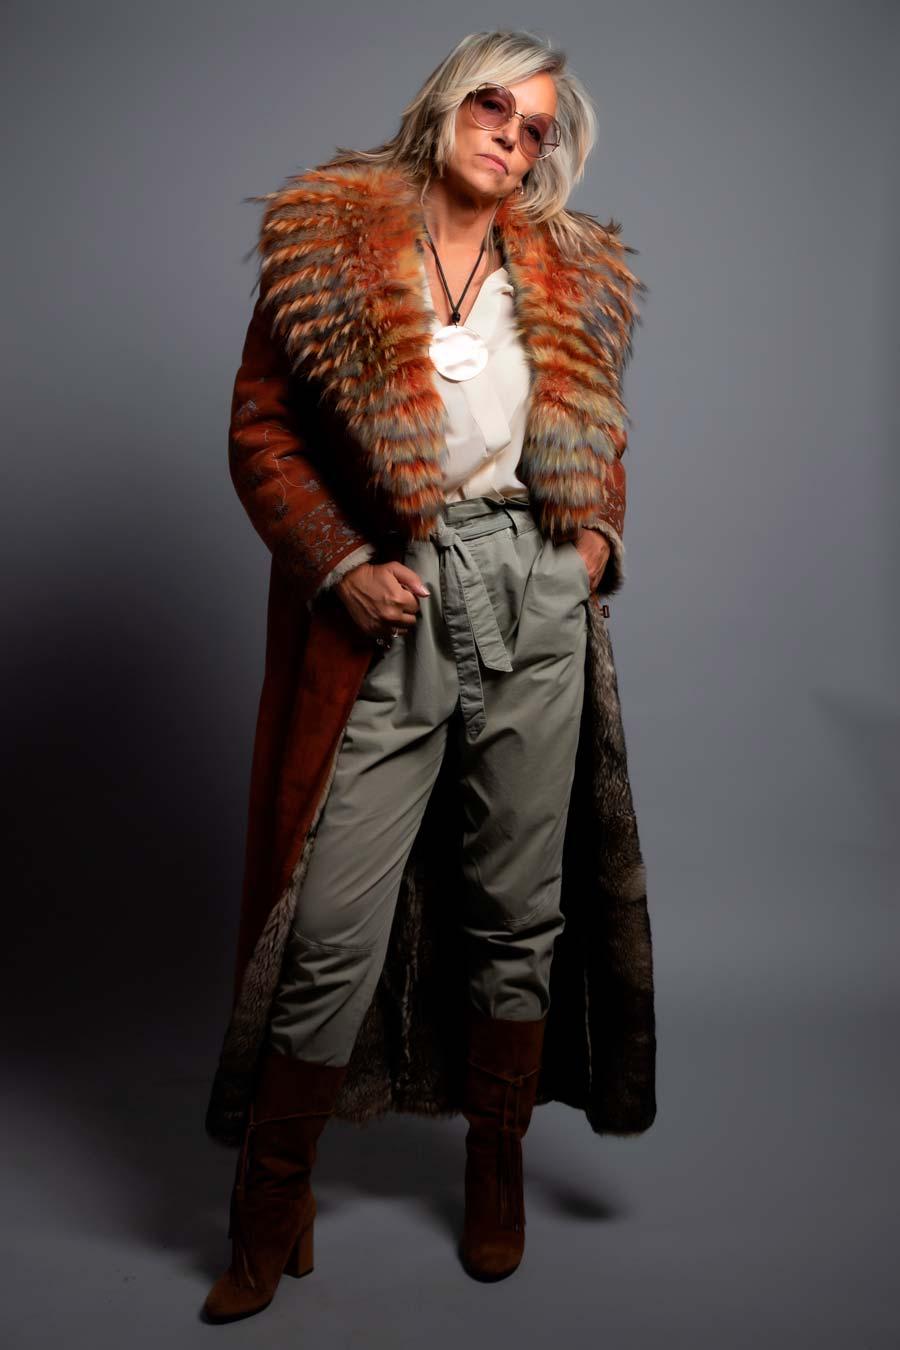 Marta-International-Photomodel-Over-50-Actress-Agency-Cosmopolitan-Vogue-Marie-Claire-Grazia-Glamour-Elle-Bazaar-New-York